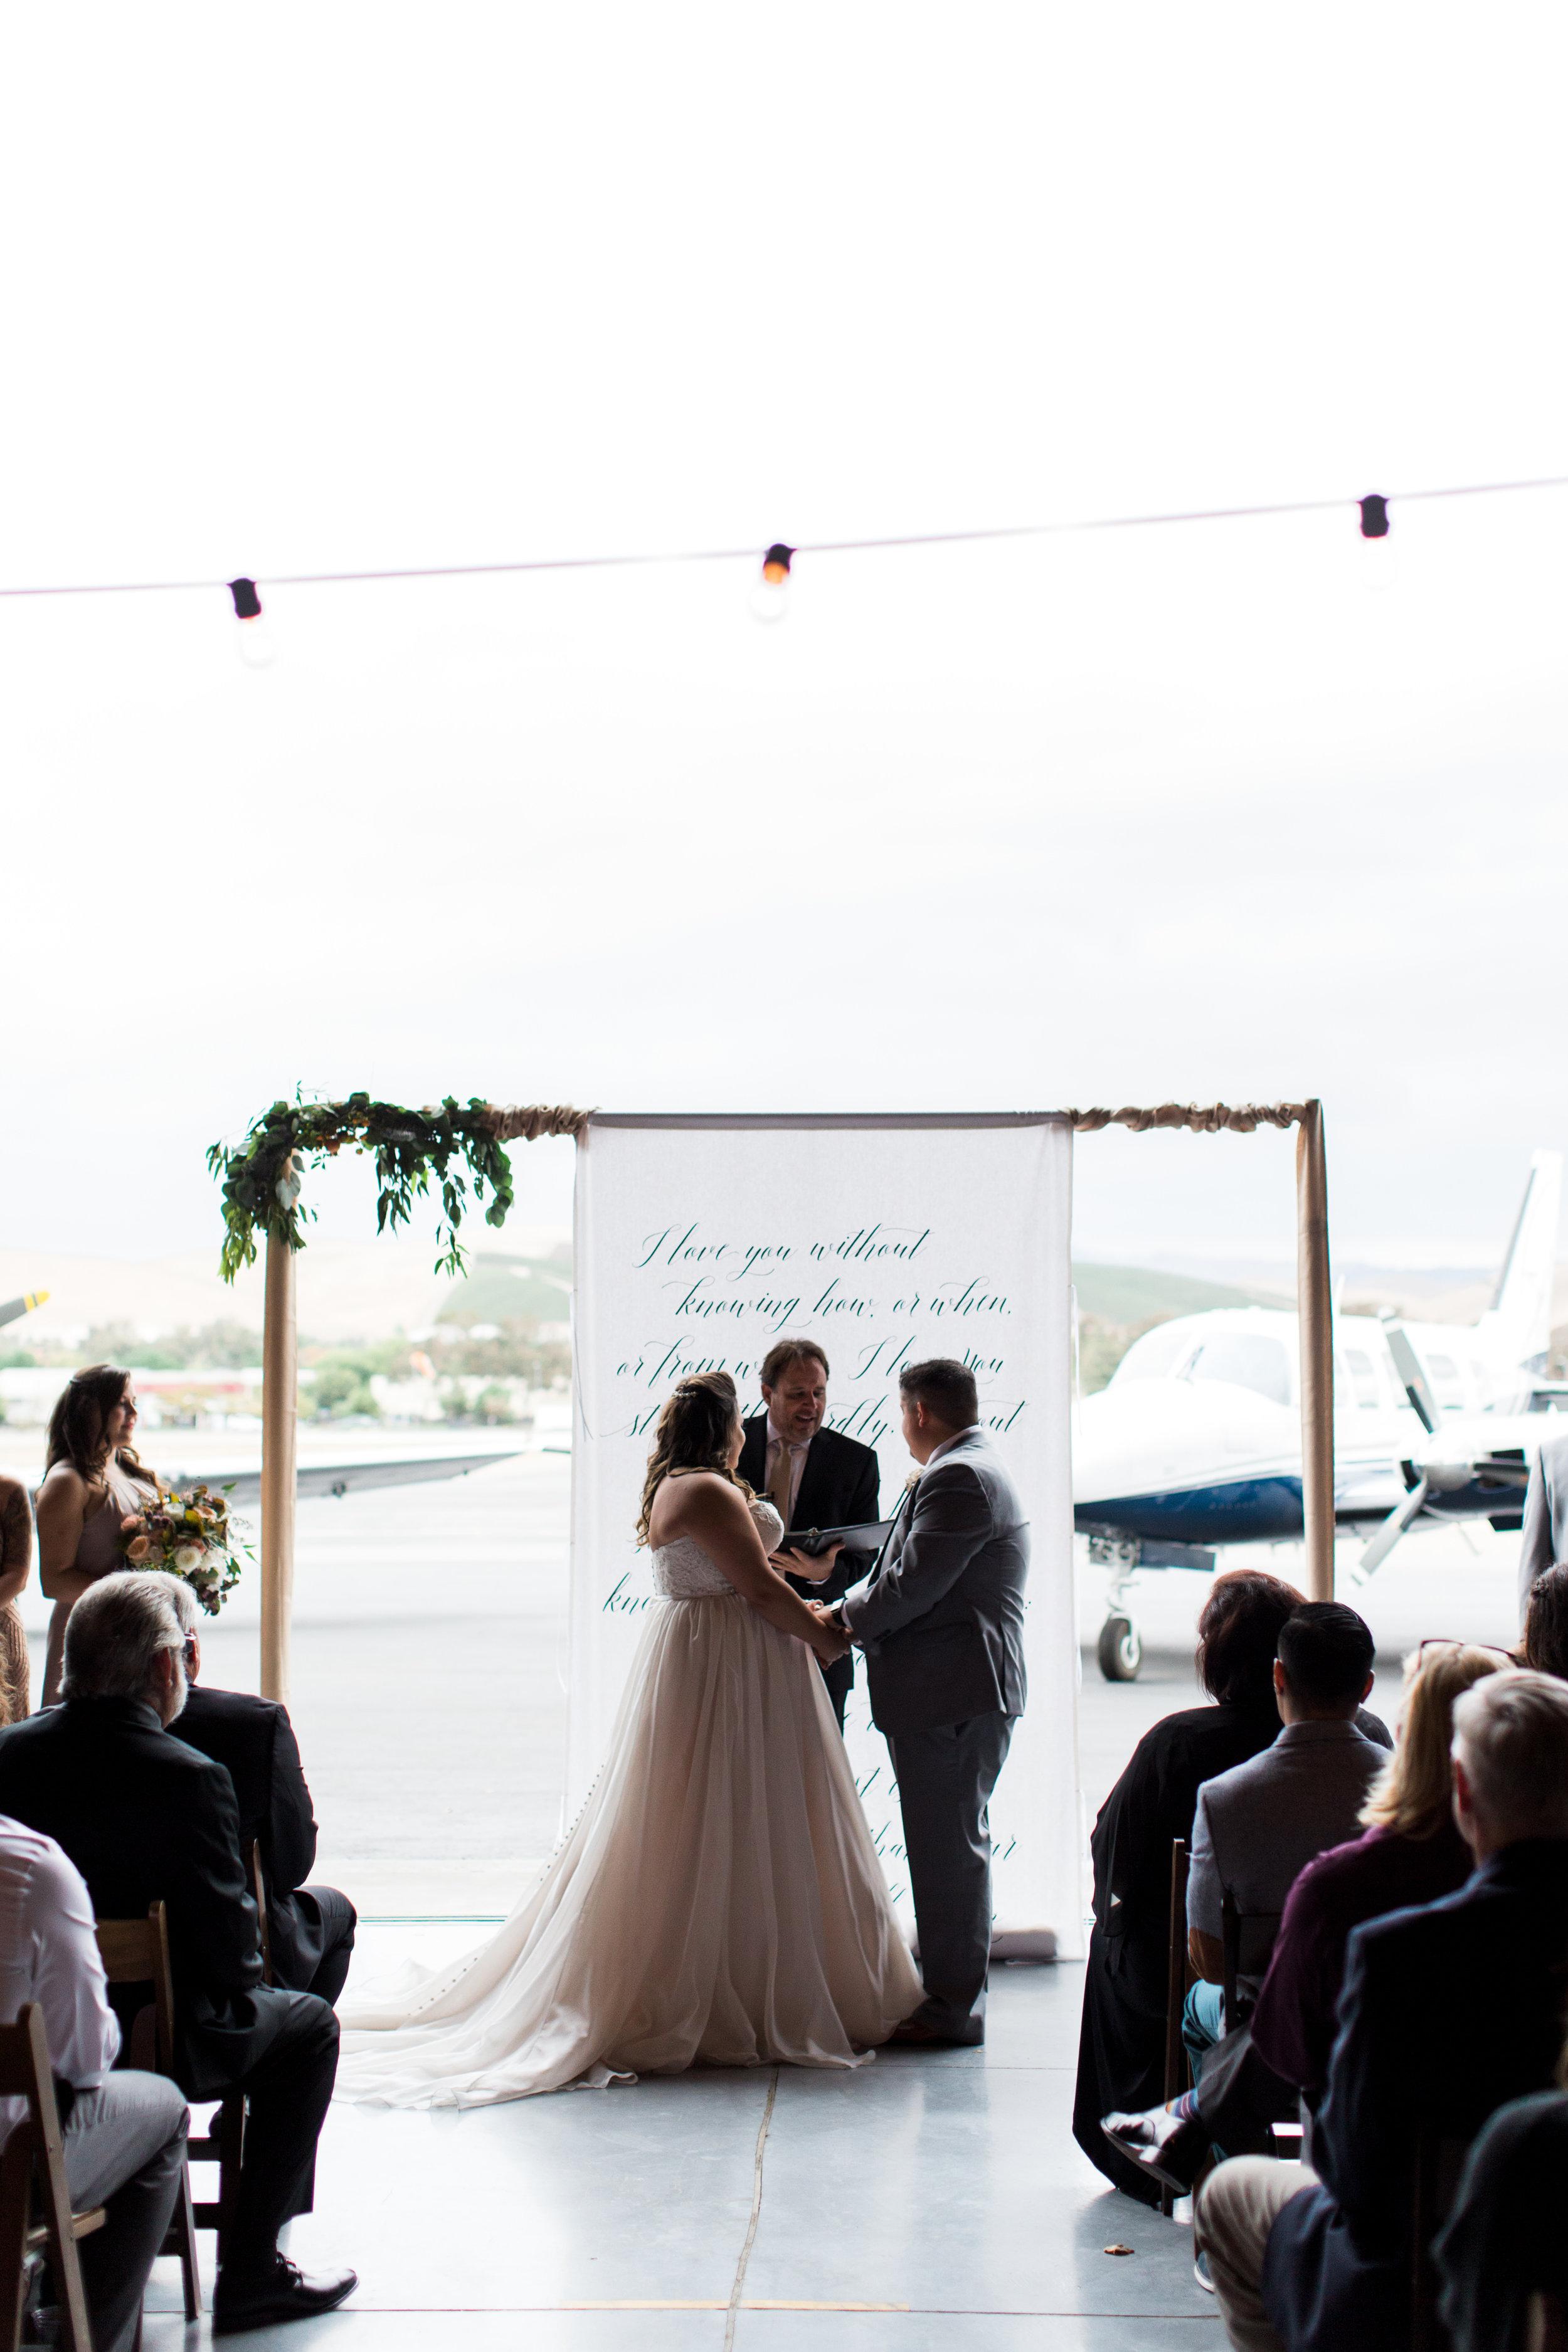 airport-hanger-wedding-at-attitude-aviation-in-livermore-56.jpg